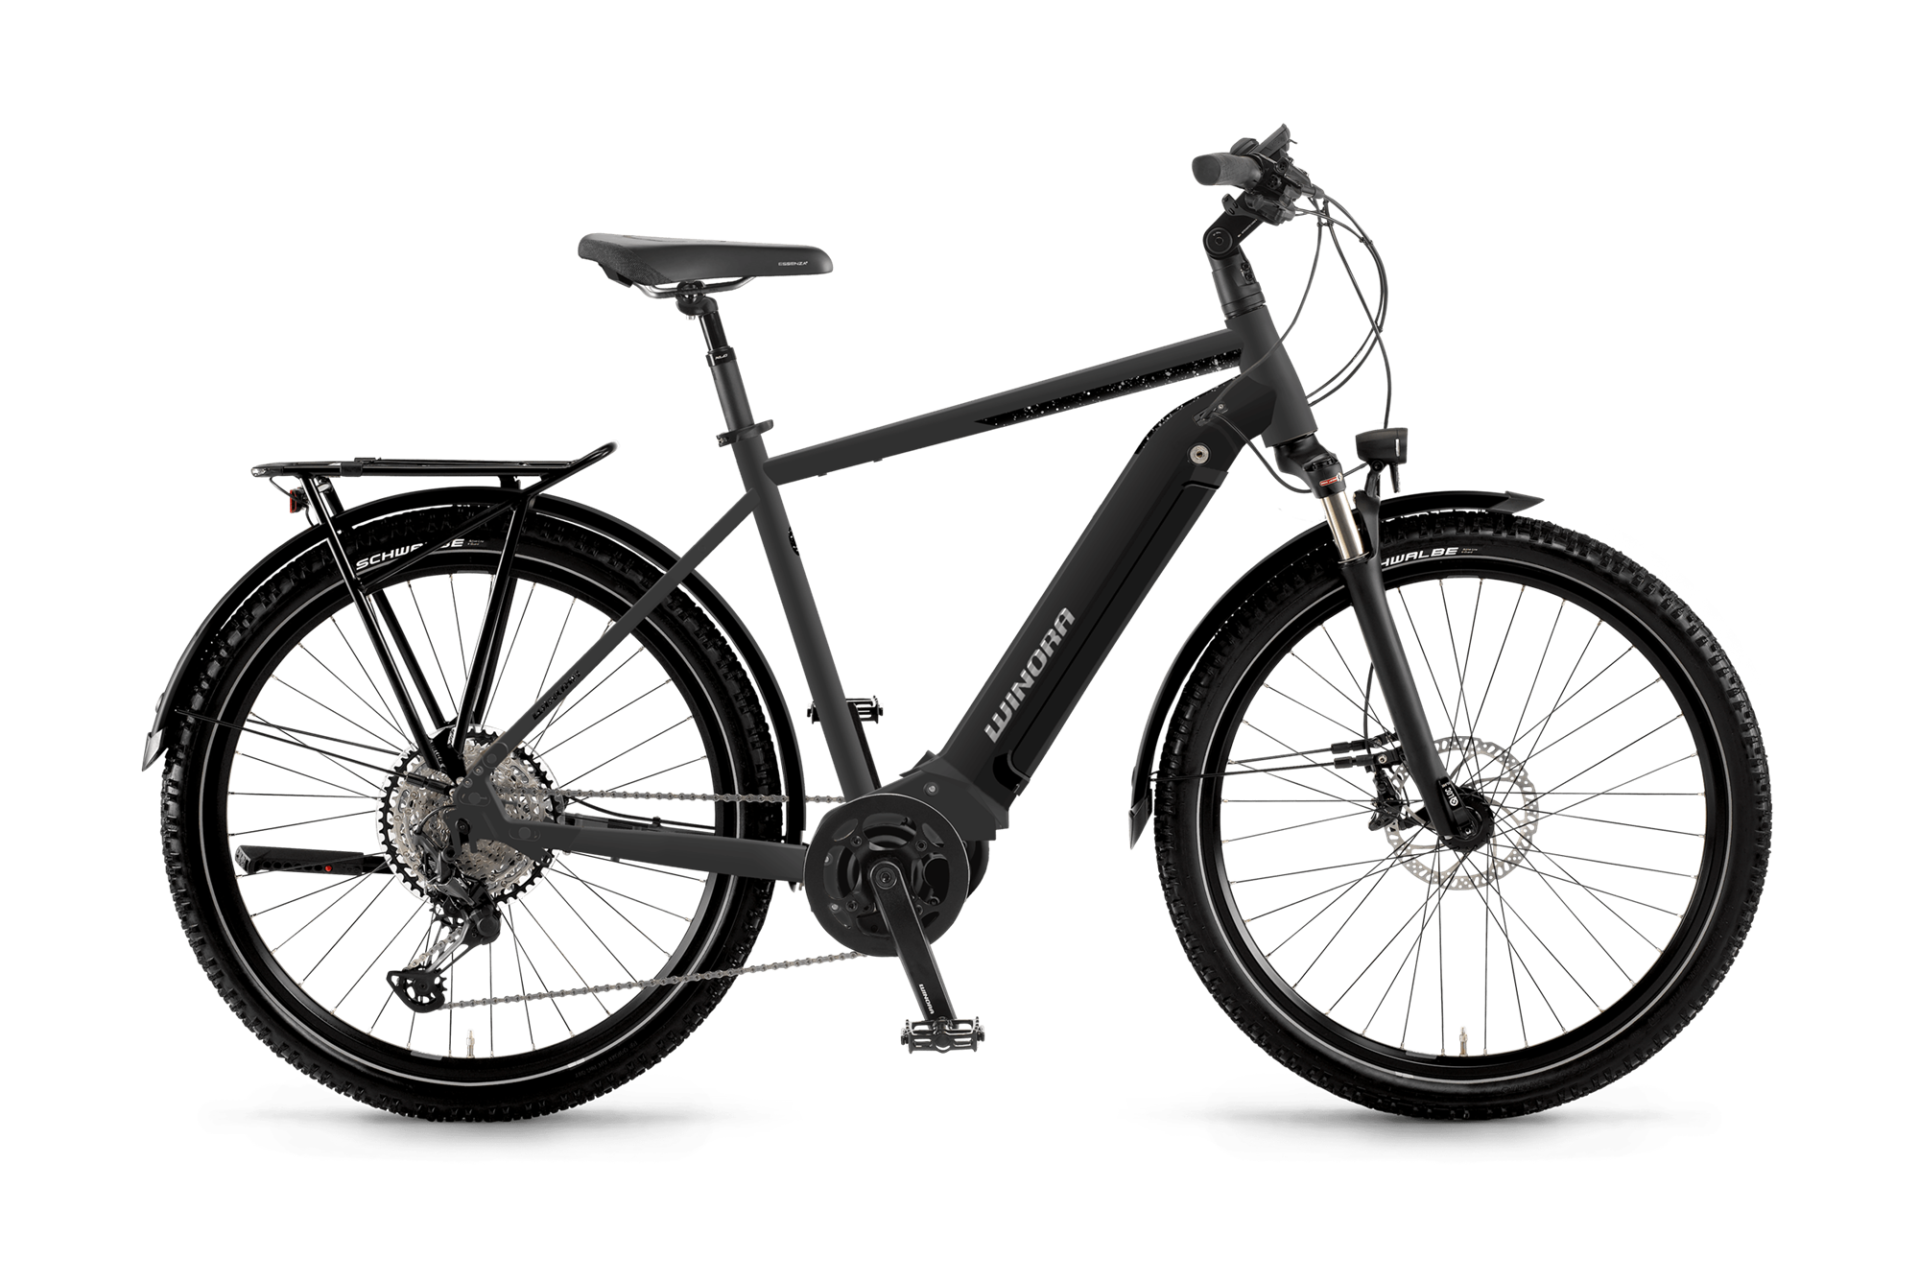 WINORA Yucatan 12 Pro férfi trekking pedelec kerékpár - 60 cm (2021)